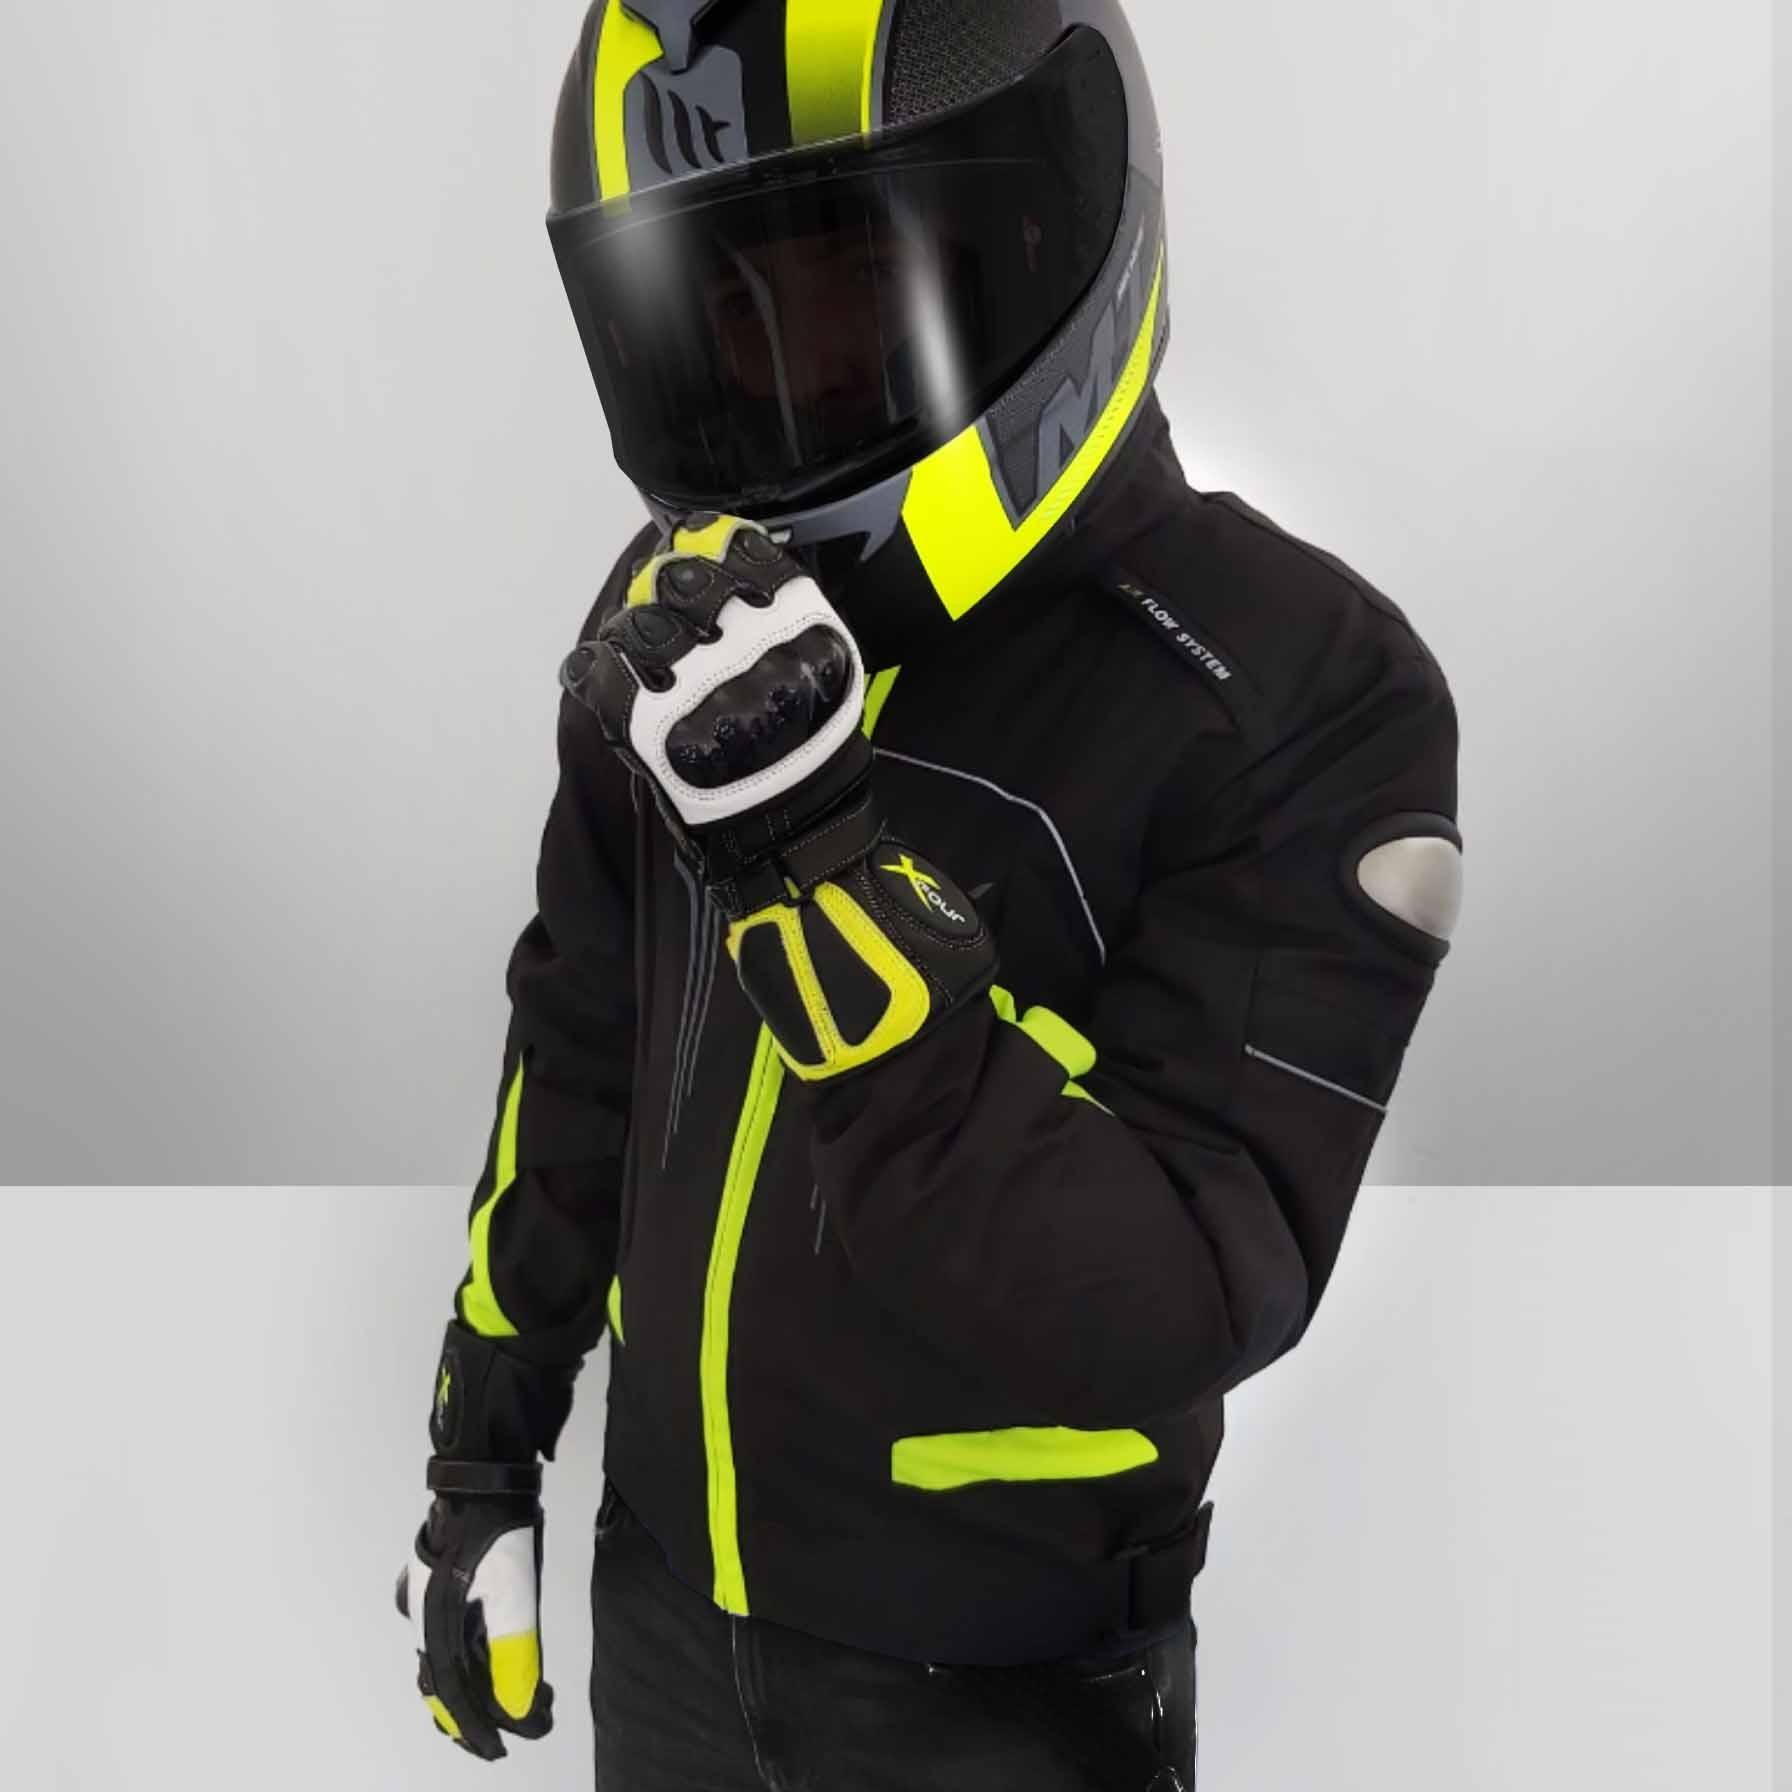 Jacket203.jpg